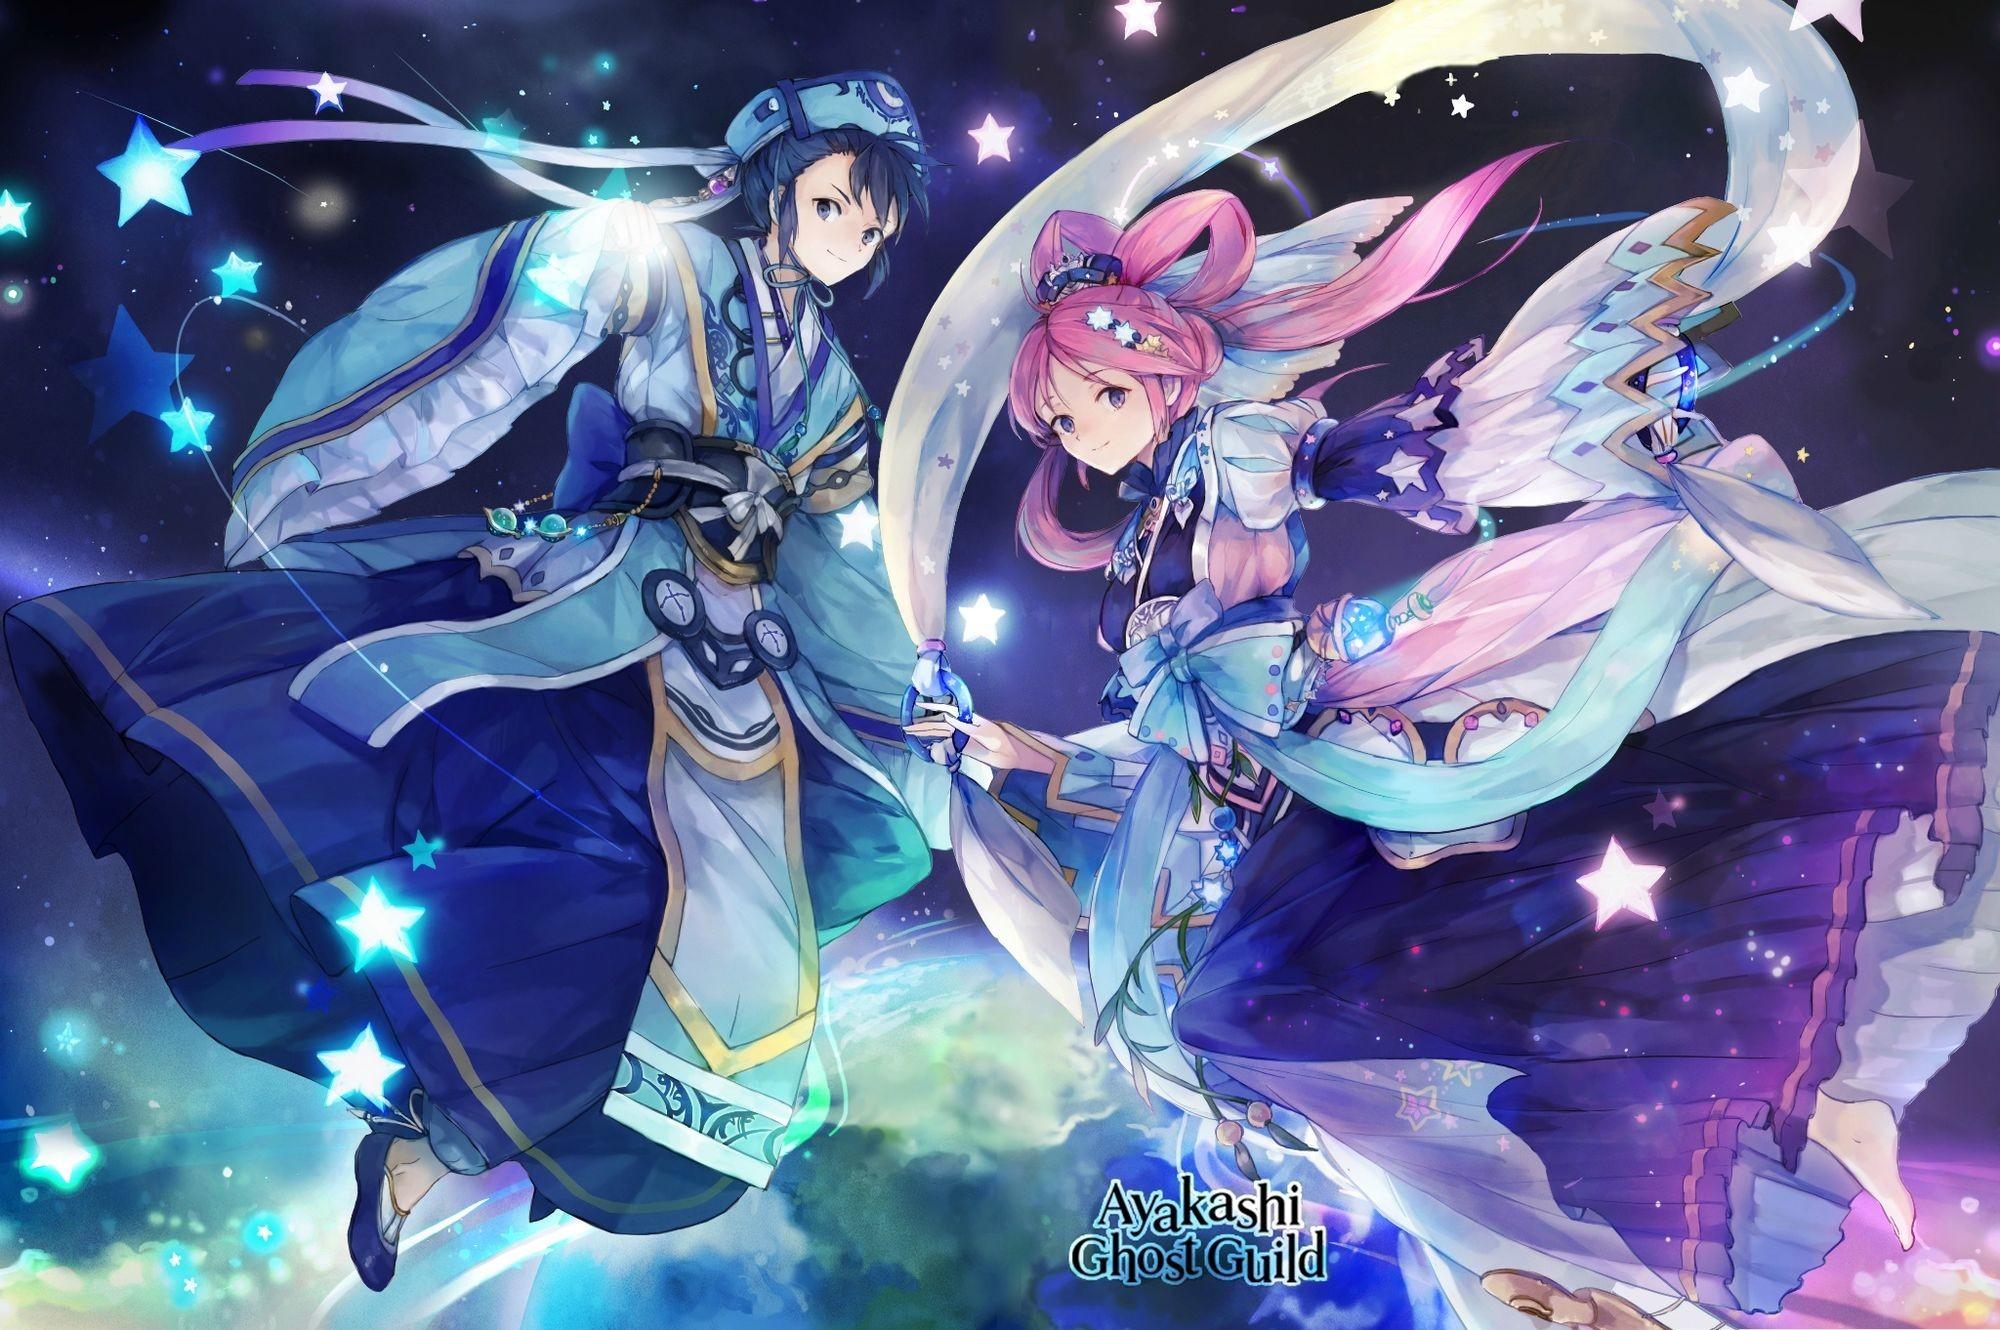 Res: 2000x1330, Orihime Hikoboshi Yggdrasil PC Wallpaper.jpeg